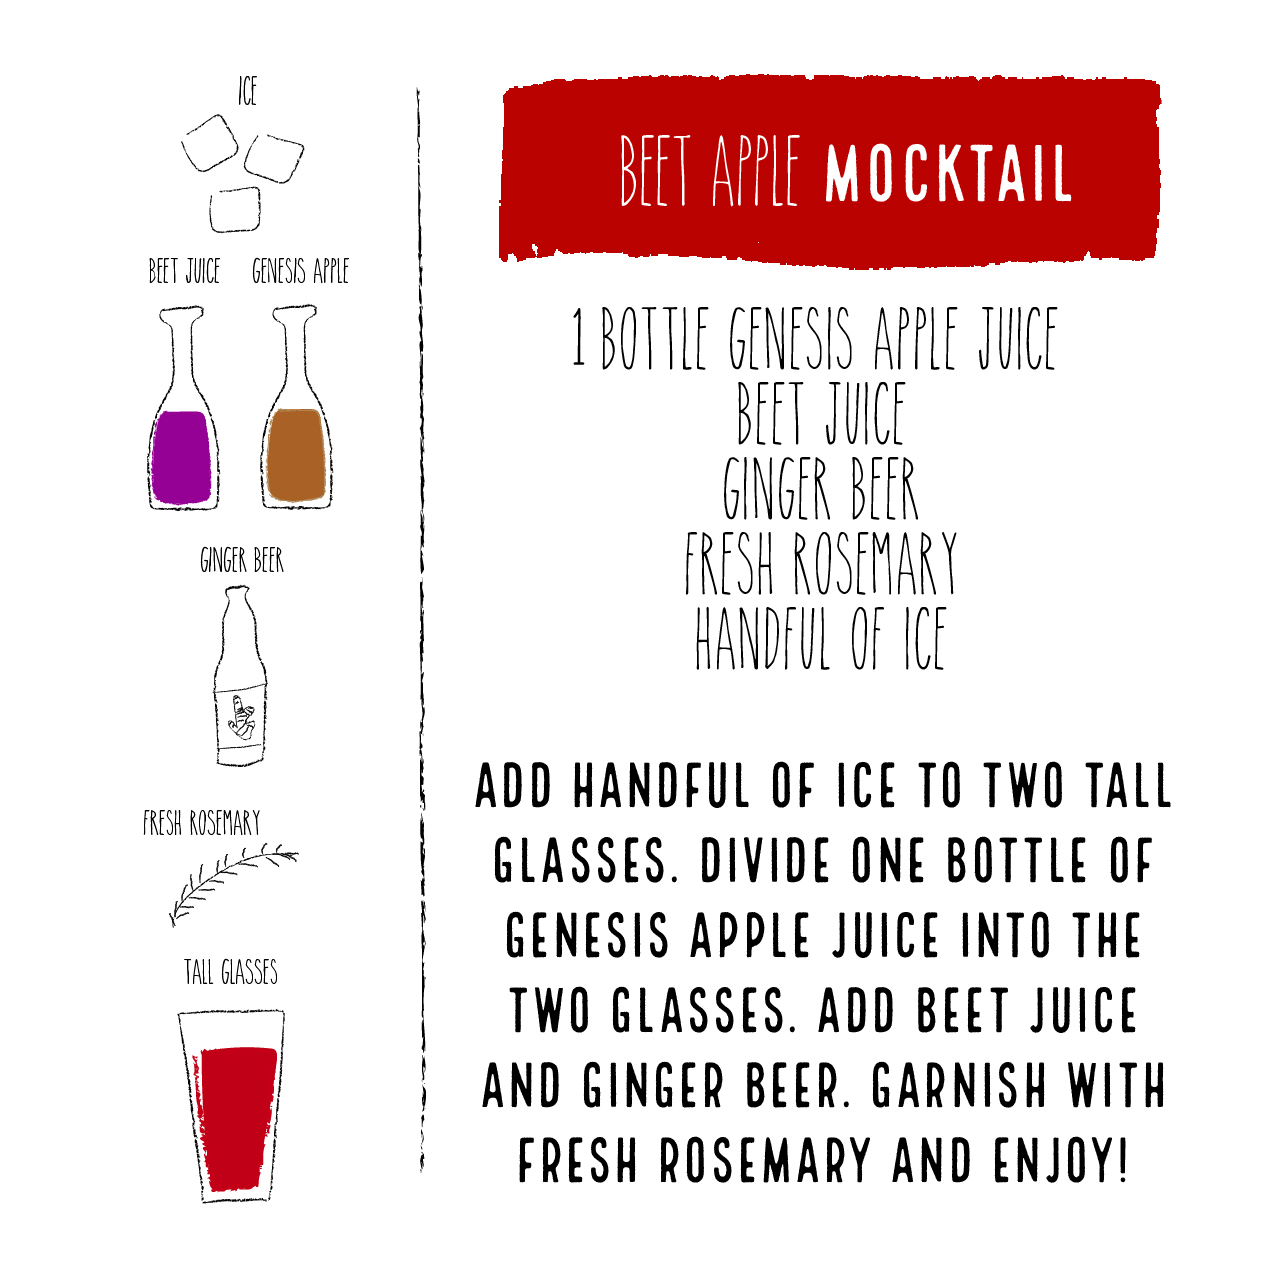 Beet Apple Mocktail Guide.jpg